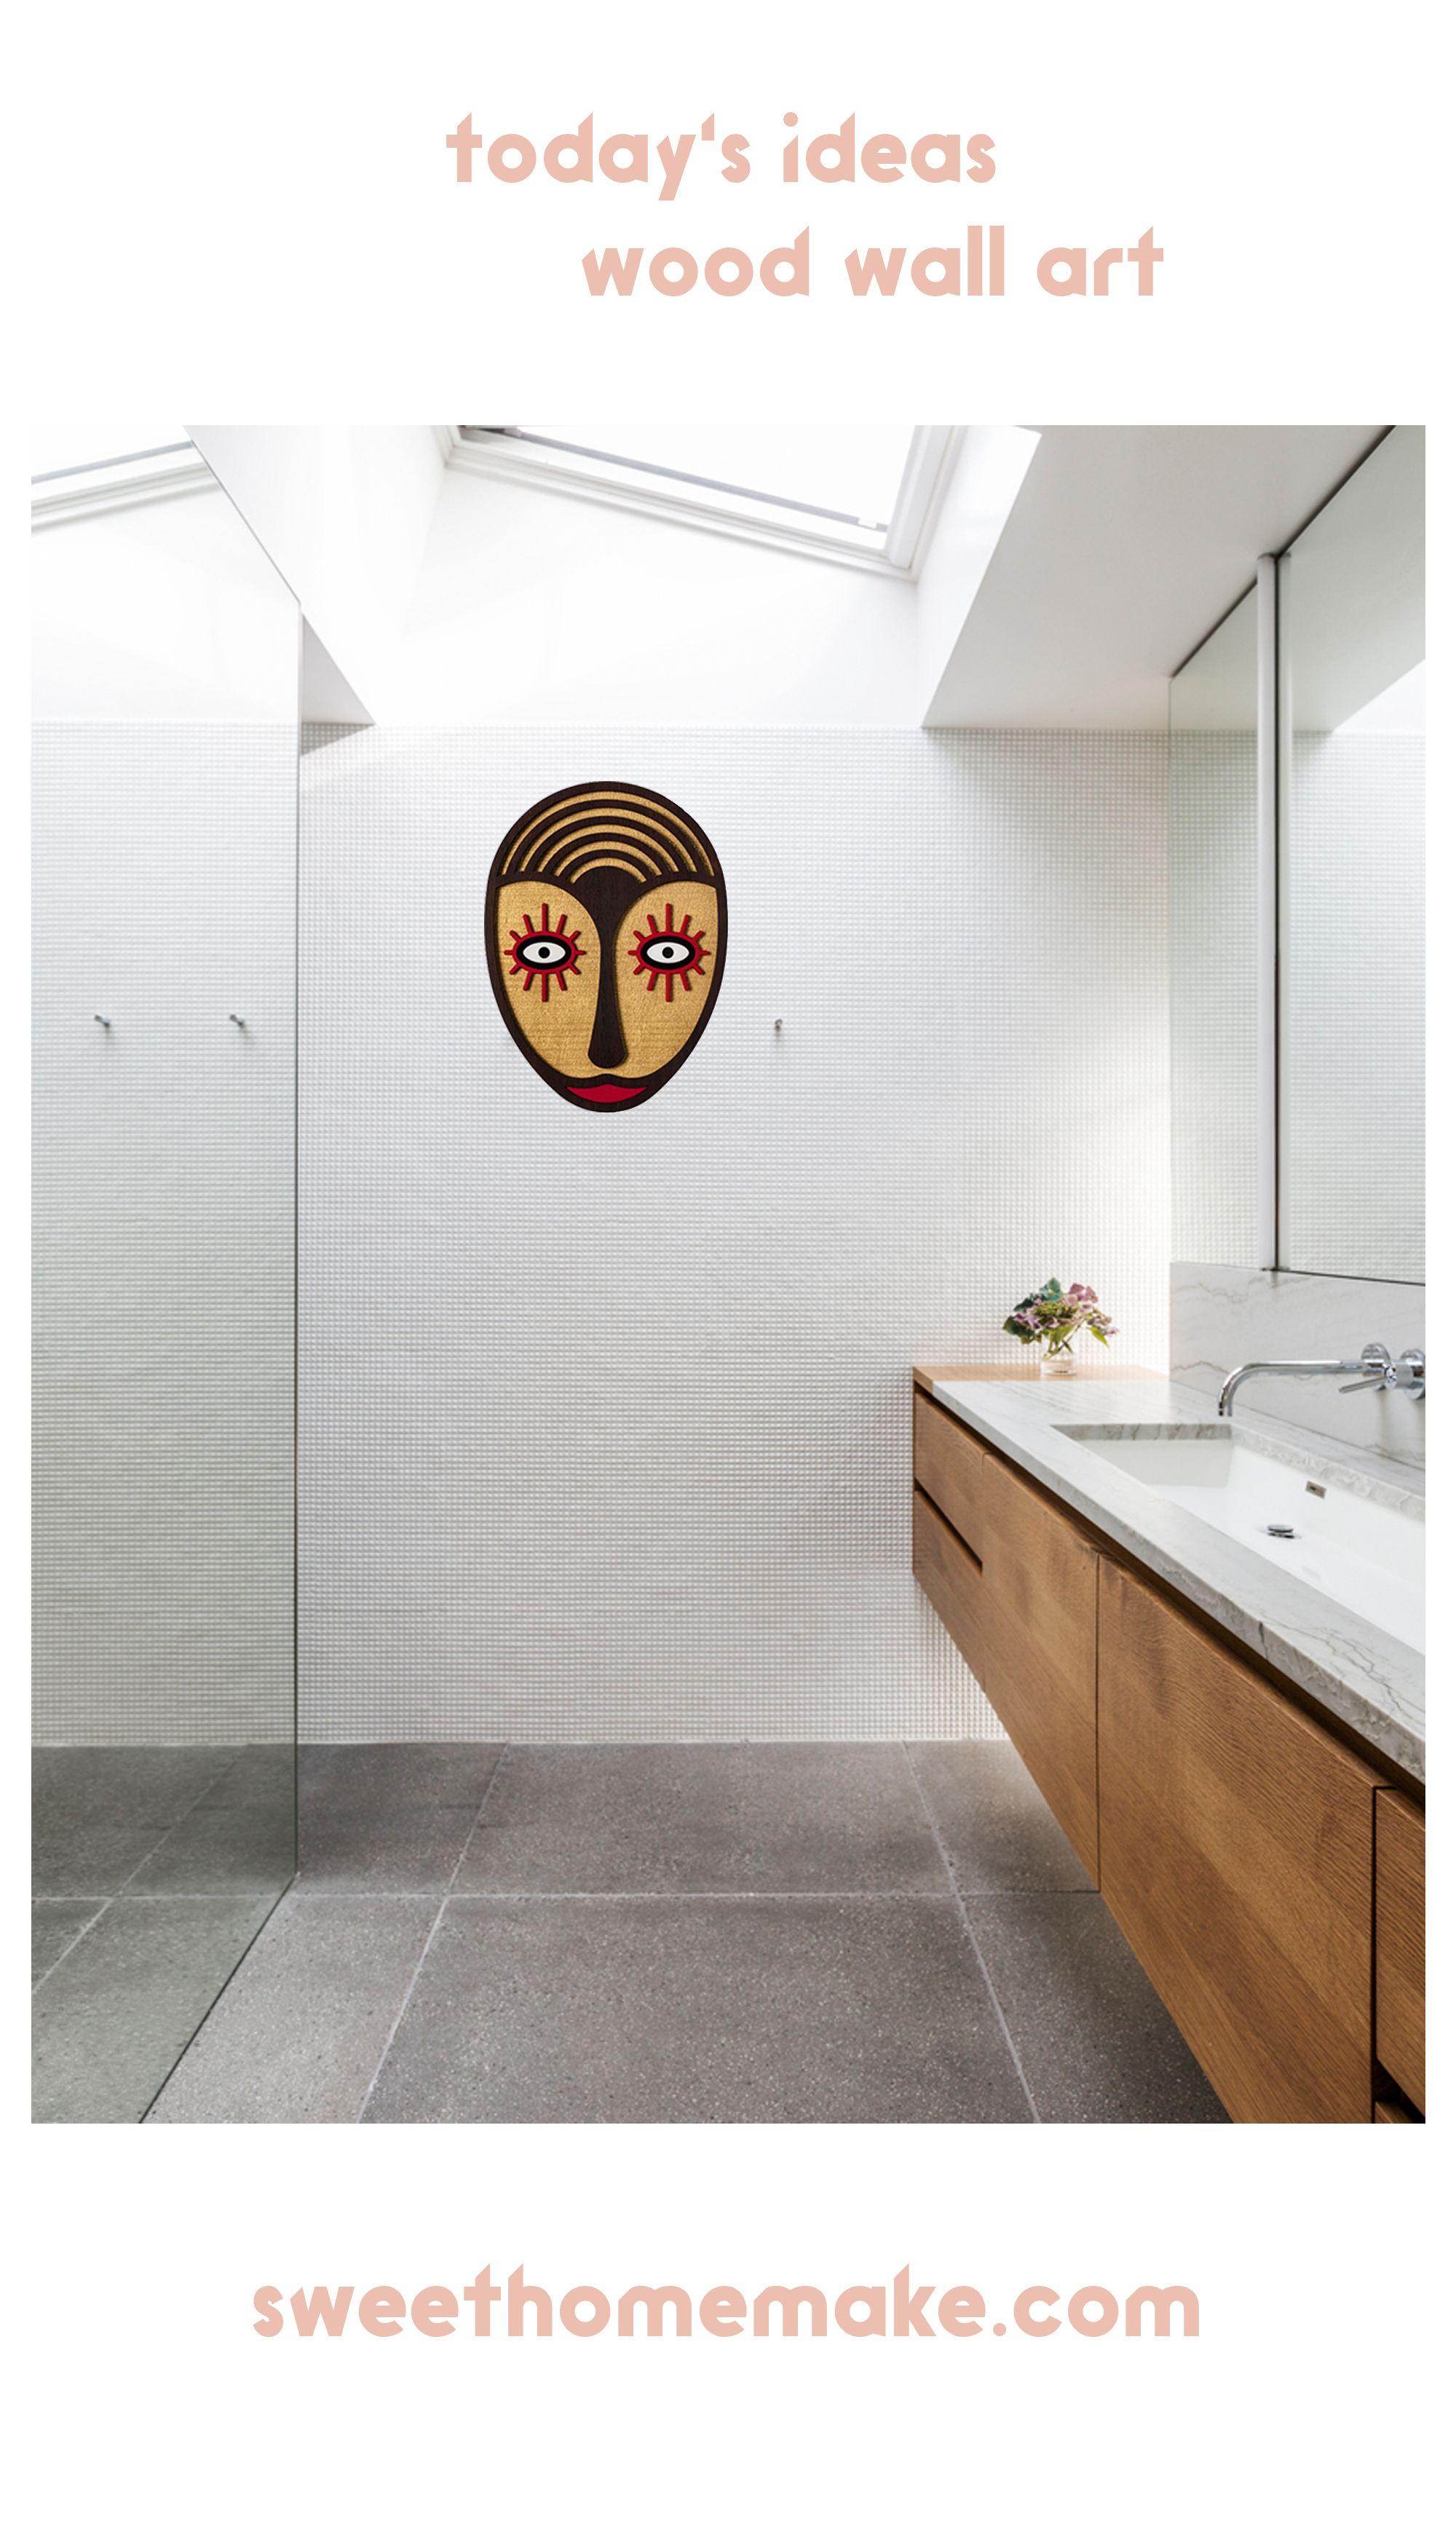 Handmade Creative Boho Wall Art With Wooden Bohemian Home Decor With Images Creative Wall Decor Bathroom Design Wall Decor Living Room